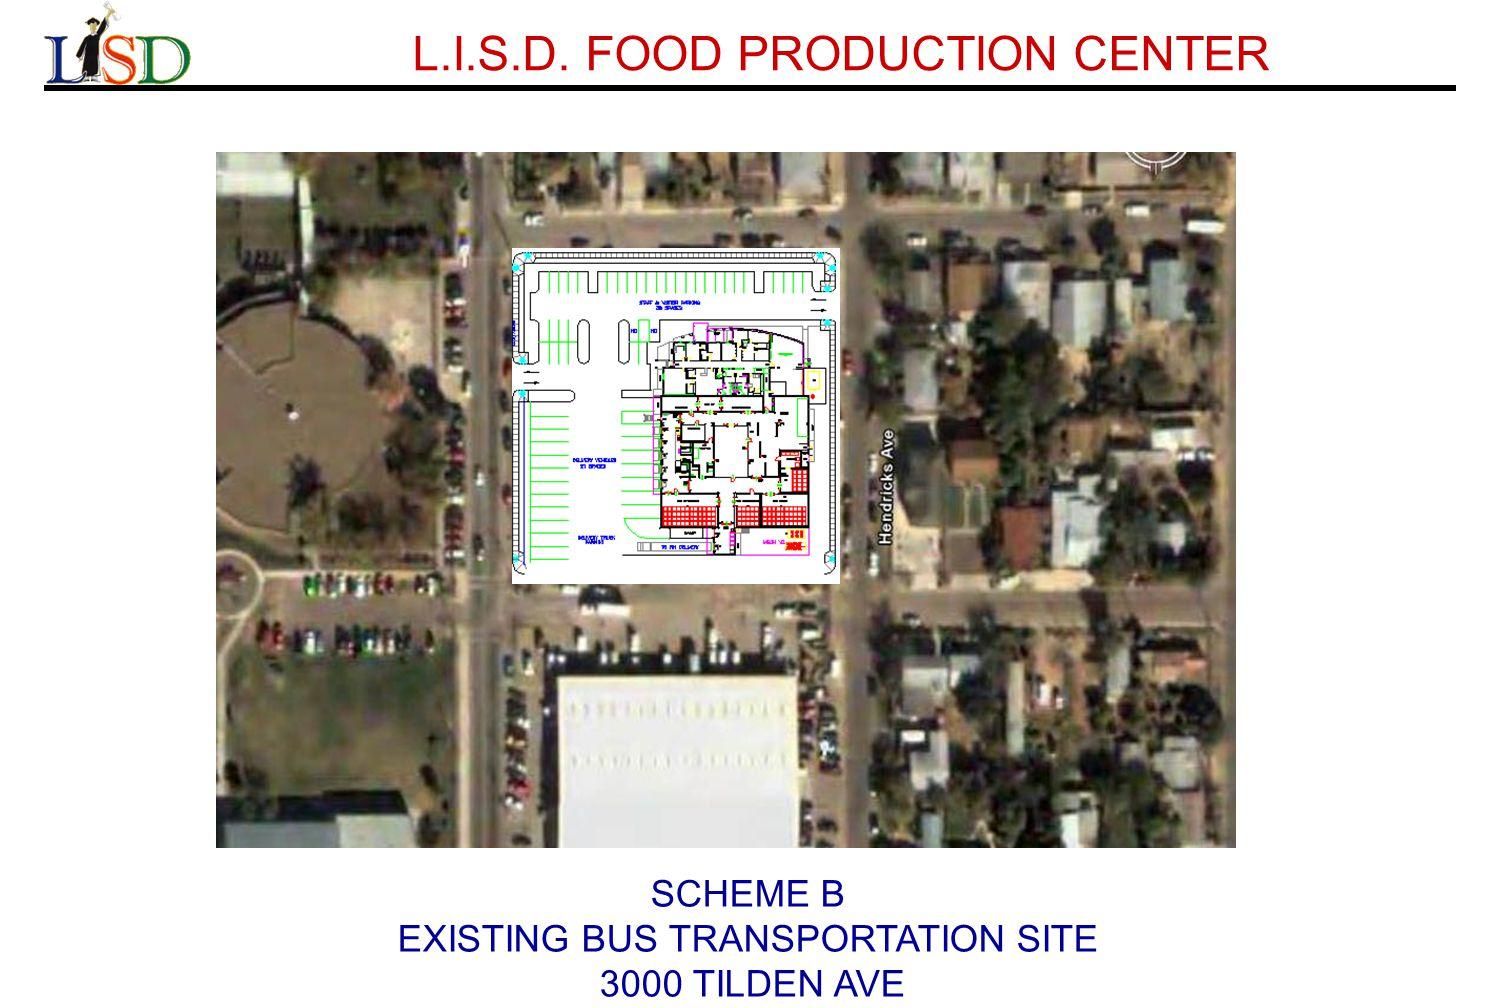 L.I.S.D. FOOD PRODUCTION CENTER SCHEME B EXISTING BUS TRANSPORTATION SITE 3000 TILDEN AVE